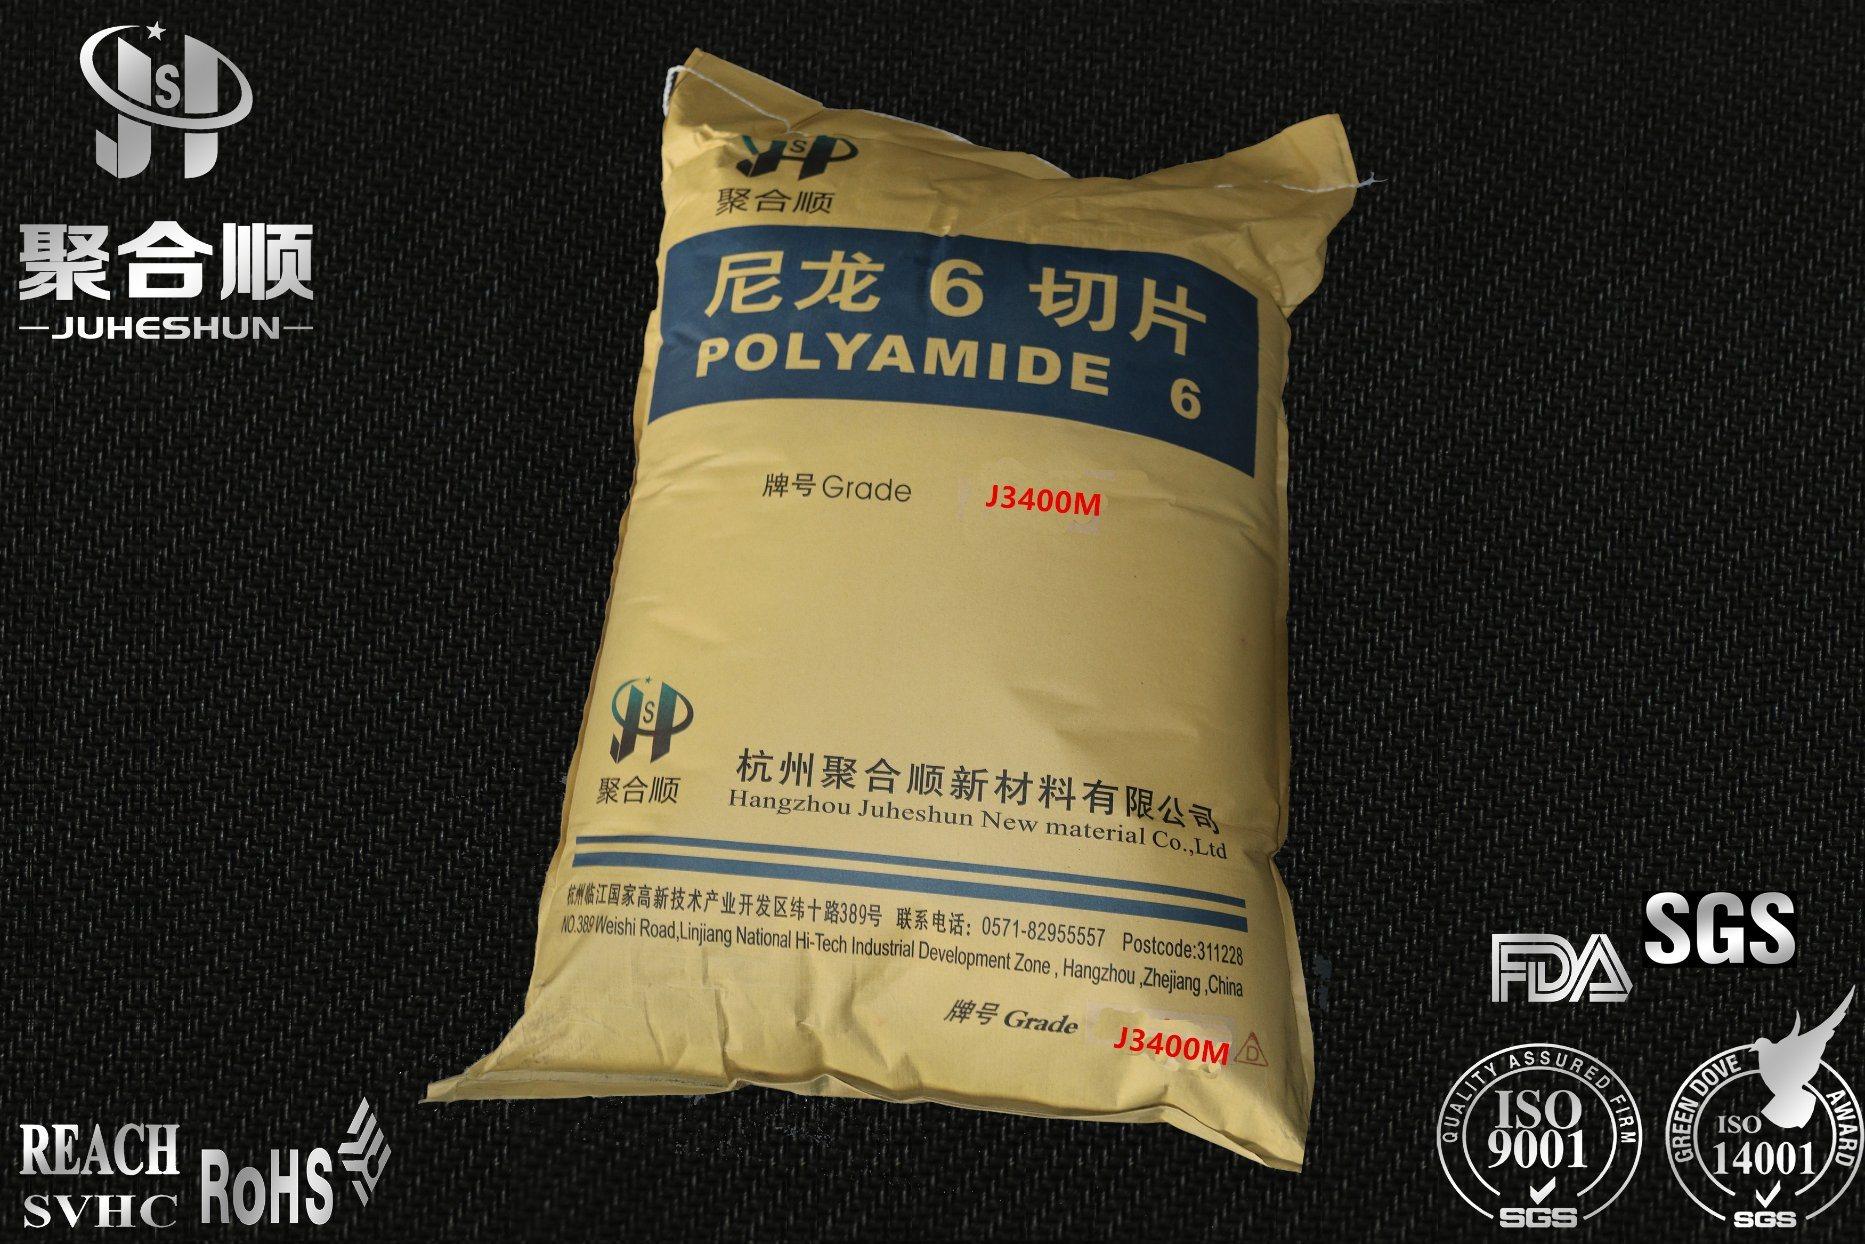 J3400m/Film Grade Nylon 6 Chips/Polyamide 6/Granules/Pellets/Plastic Raw Material/PA6 Chips